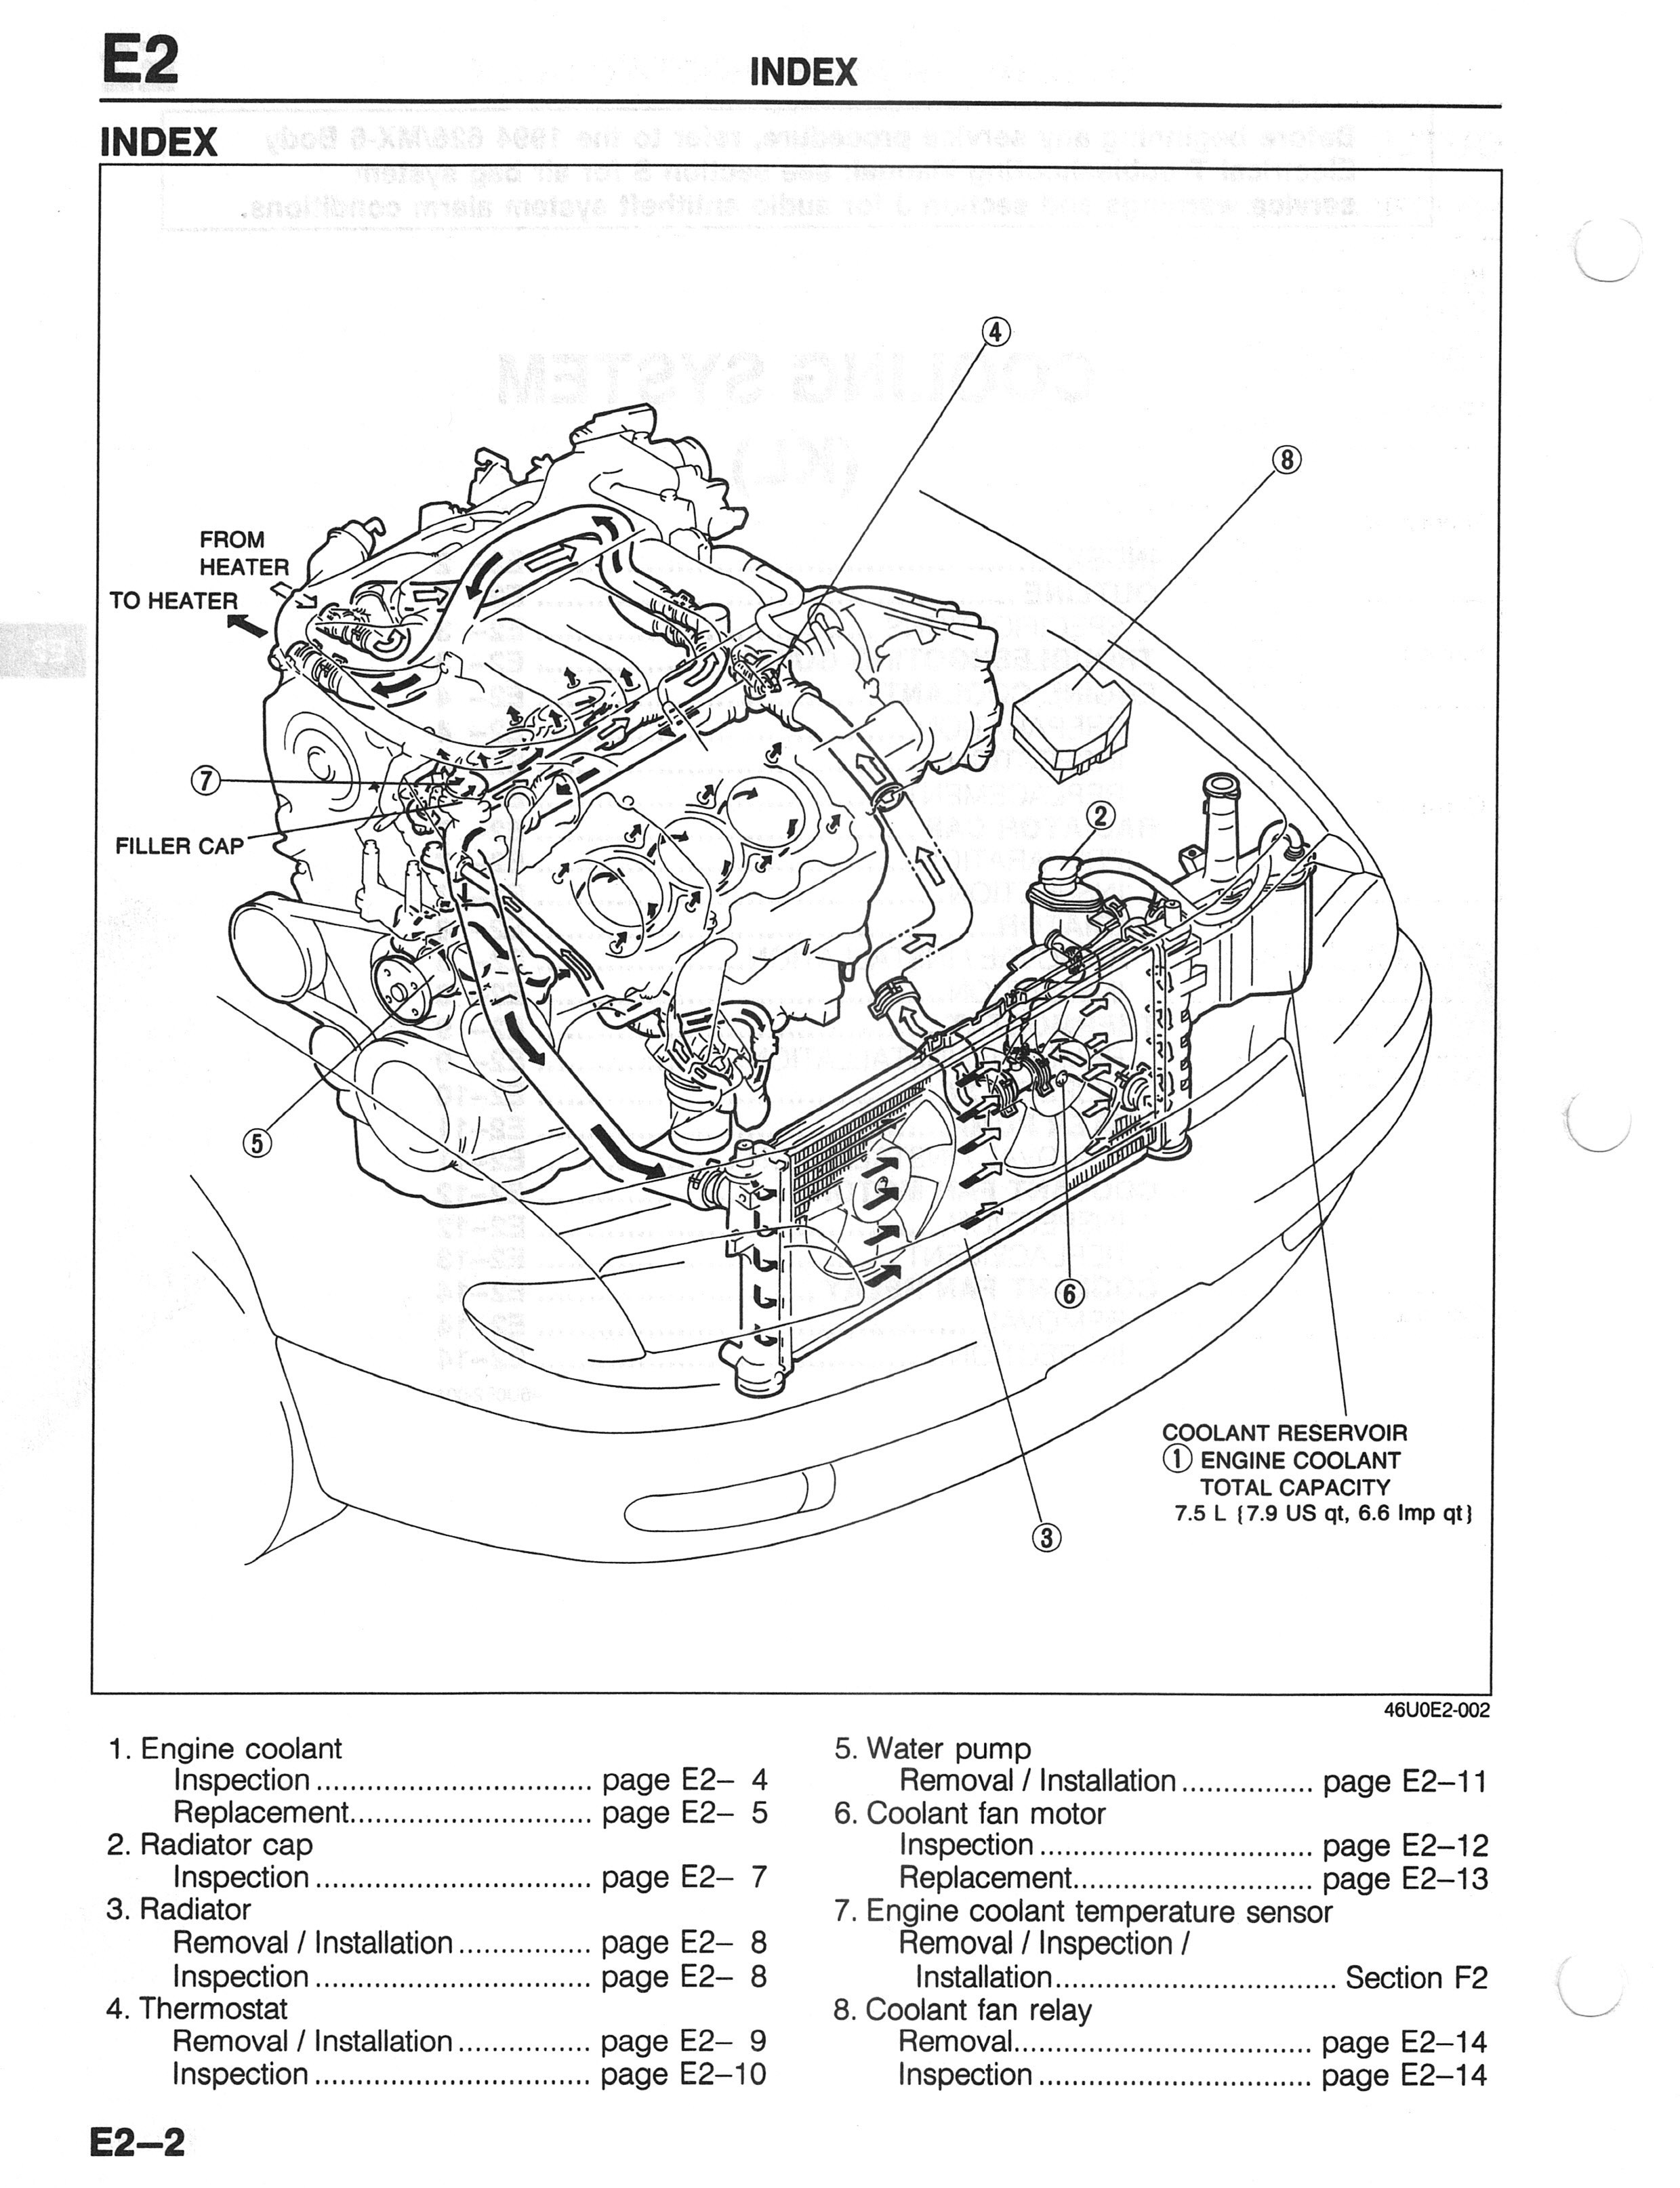 4y toyota Timing Marks 2004 Mazda 6 V6 Engine Diagram Wiring Diagram Explained A Of 4y toyota Timing Marks